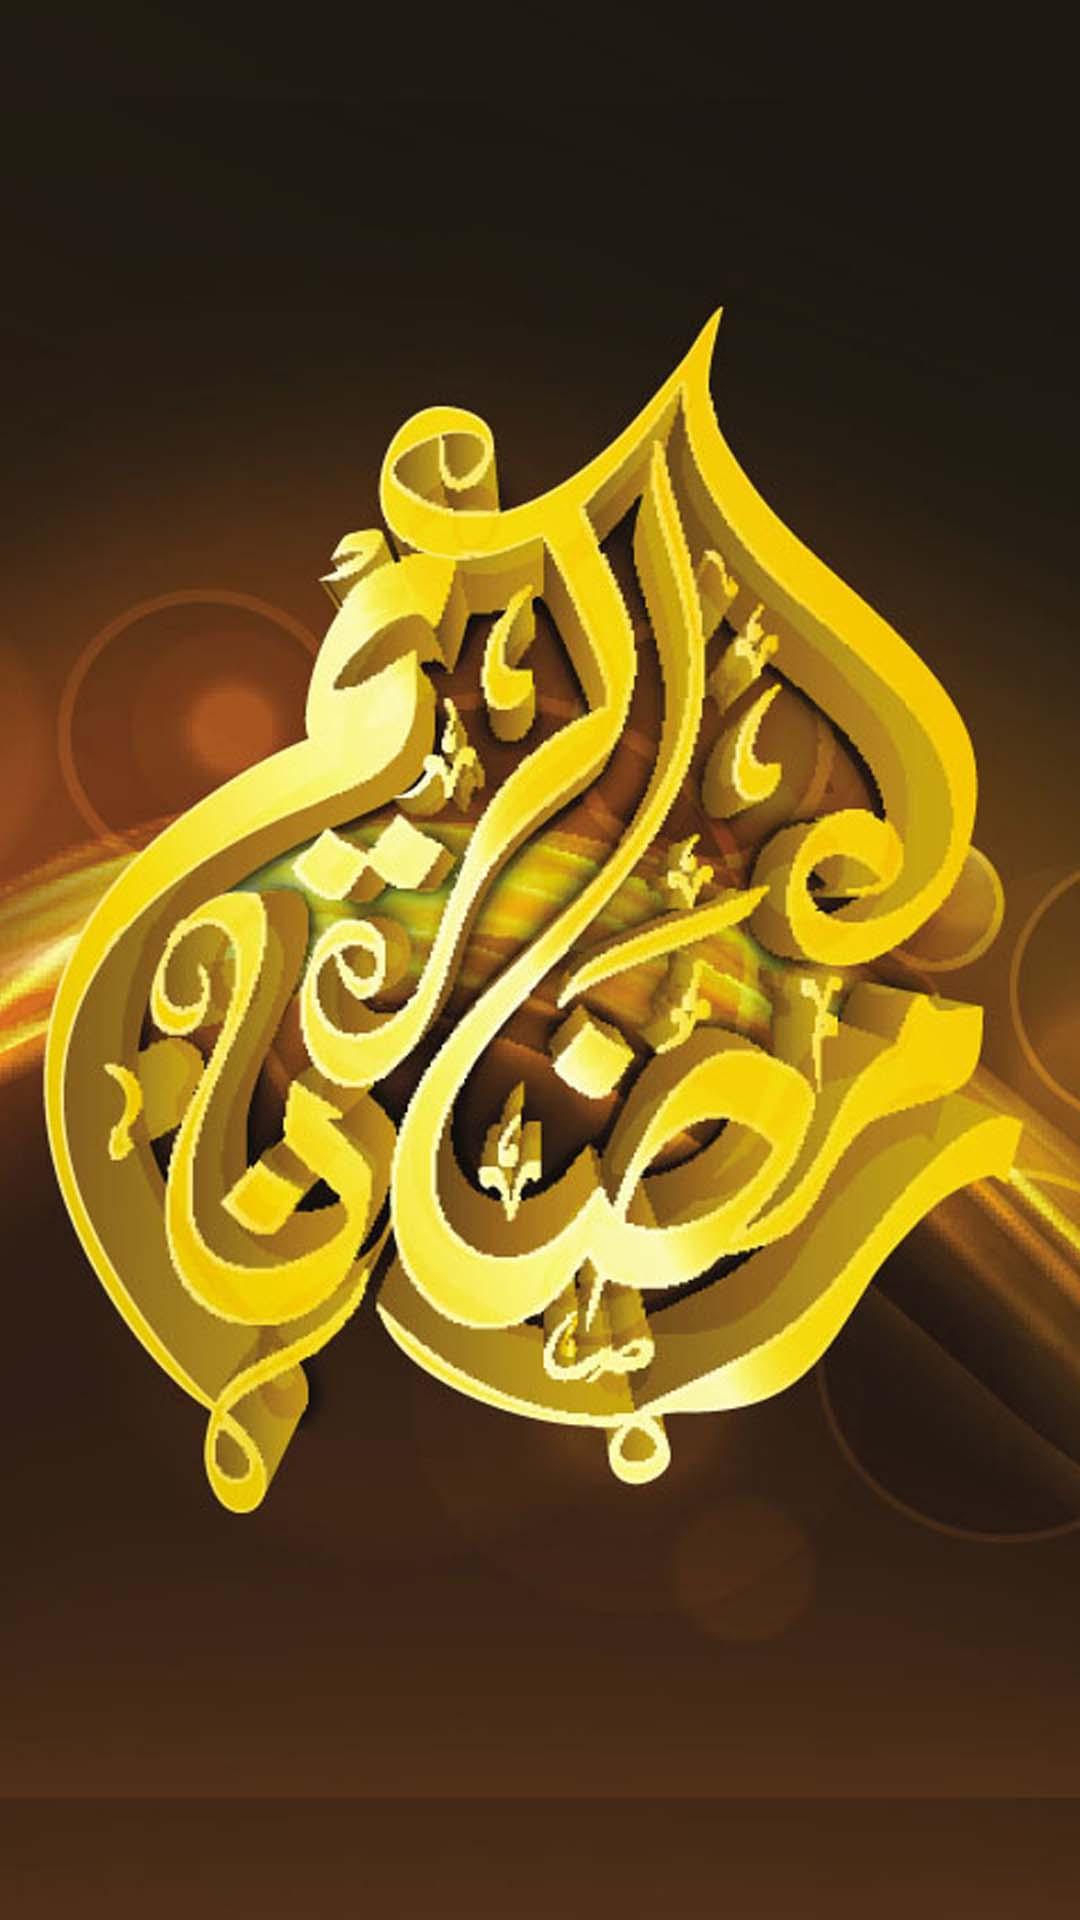 خلفيات موبايل رمضان كريم Mobile Wallpapers HD 9 خلفيات موبايل رمضان كريم Mobile Wallpapers HD